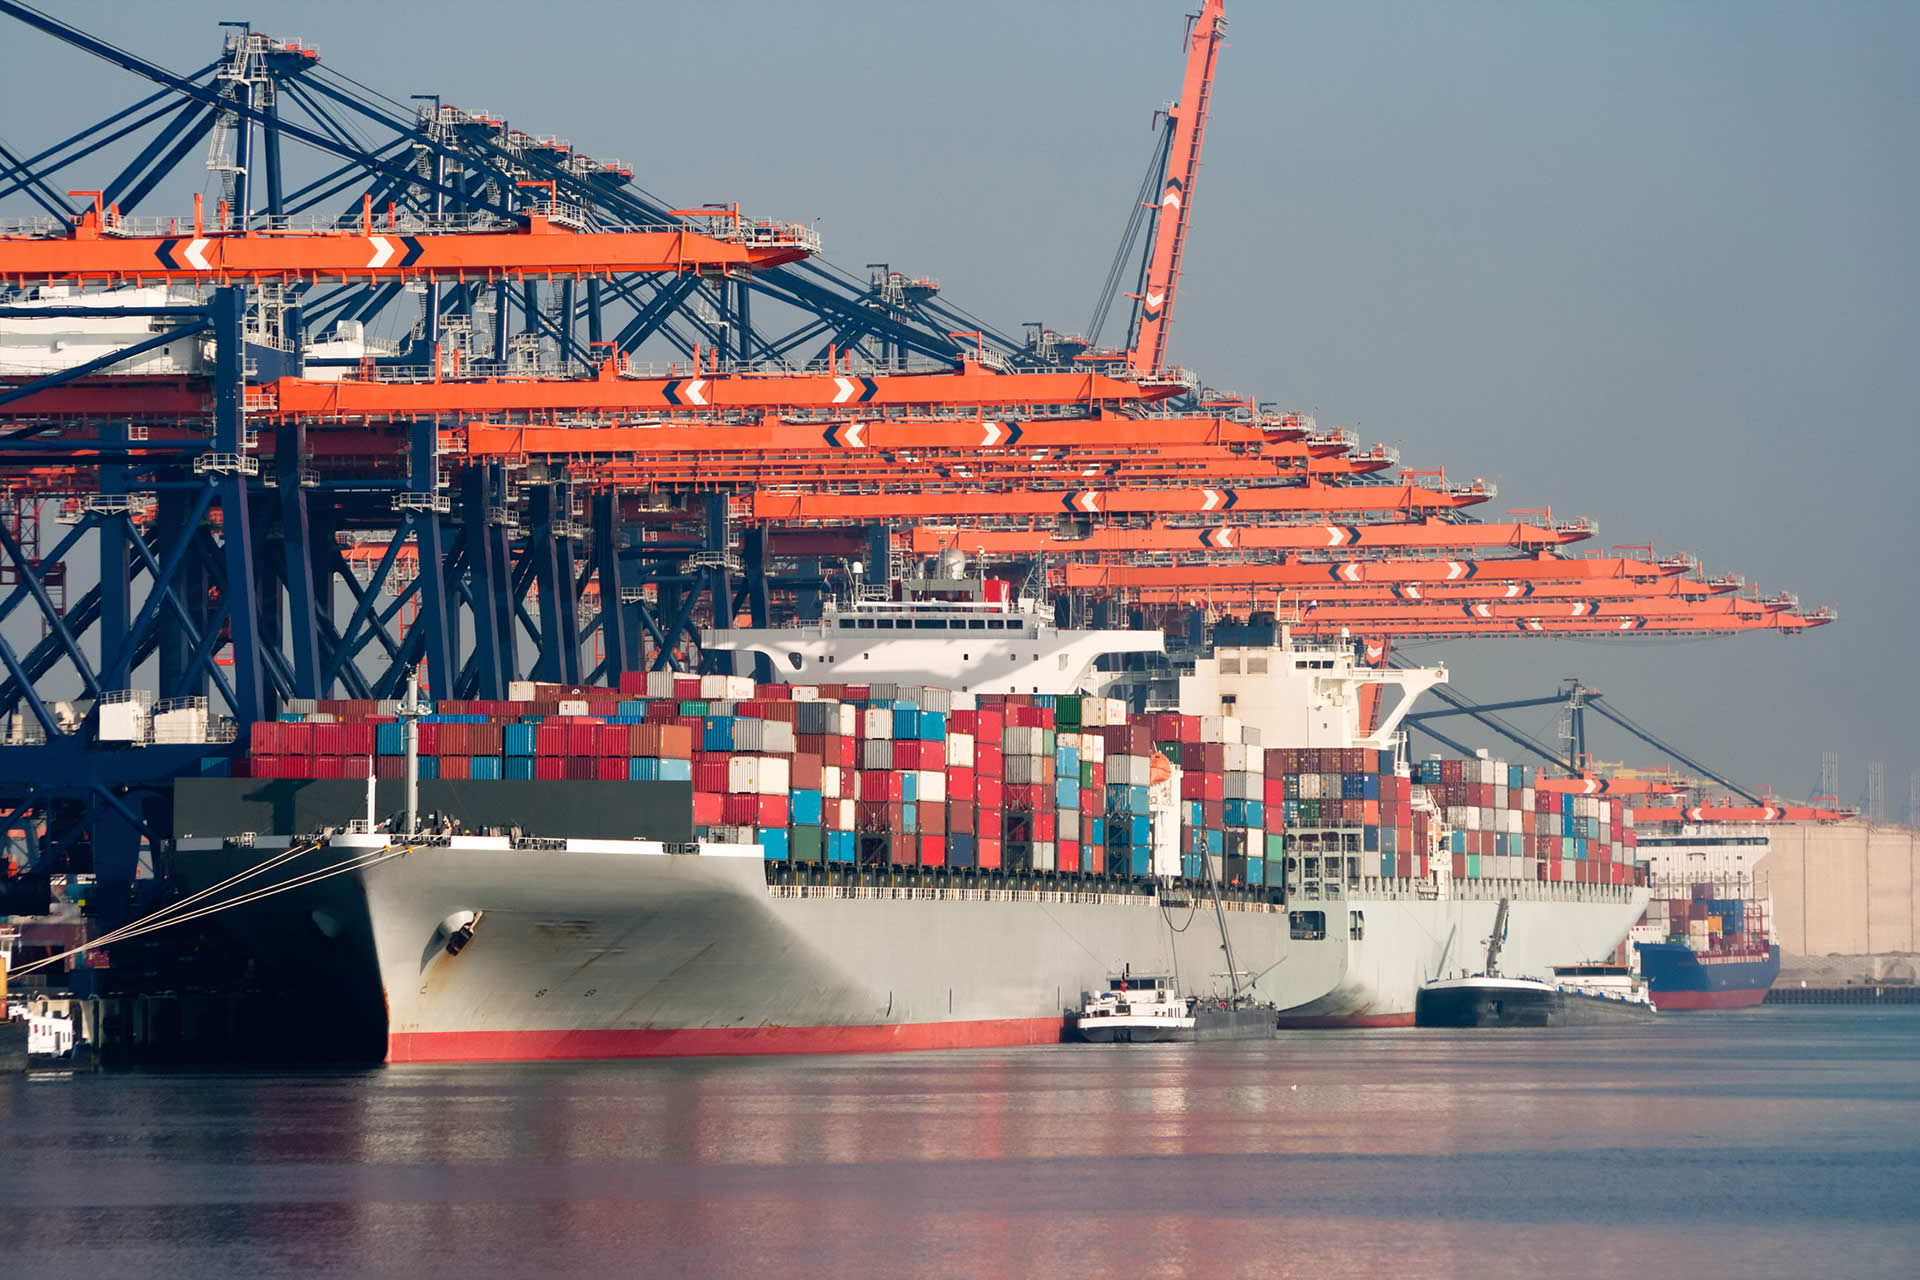 International Freight Forwarding – Atlantic Marine Services